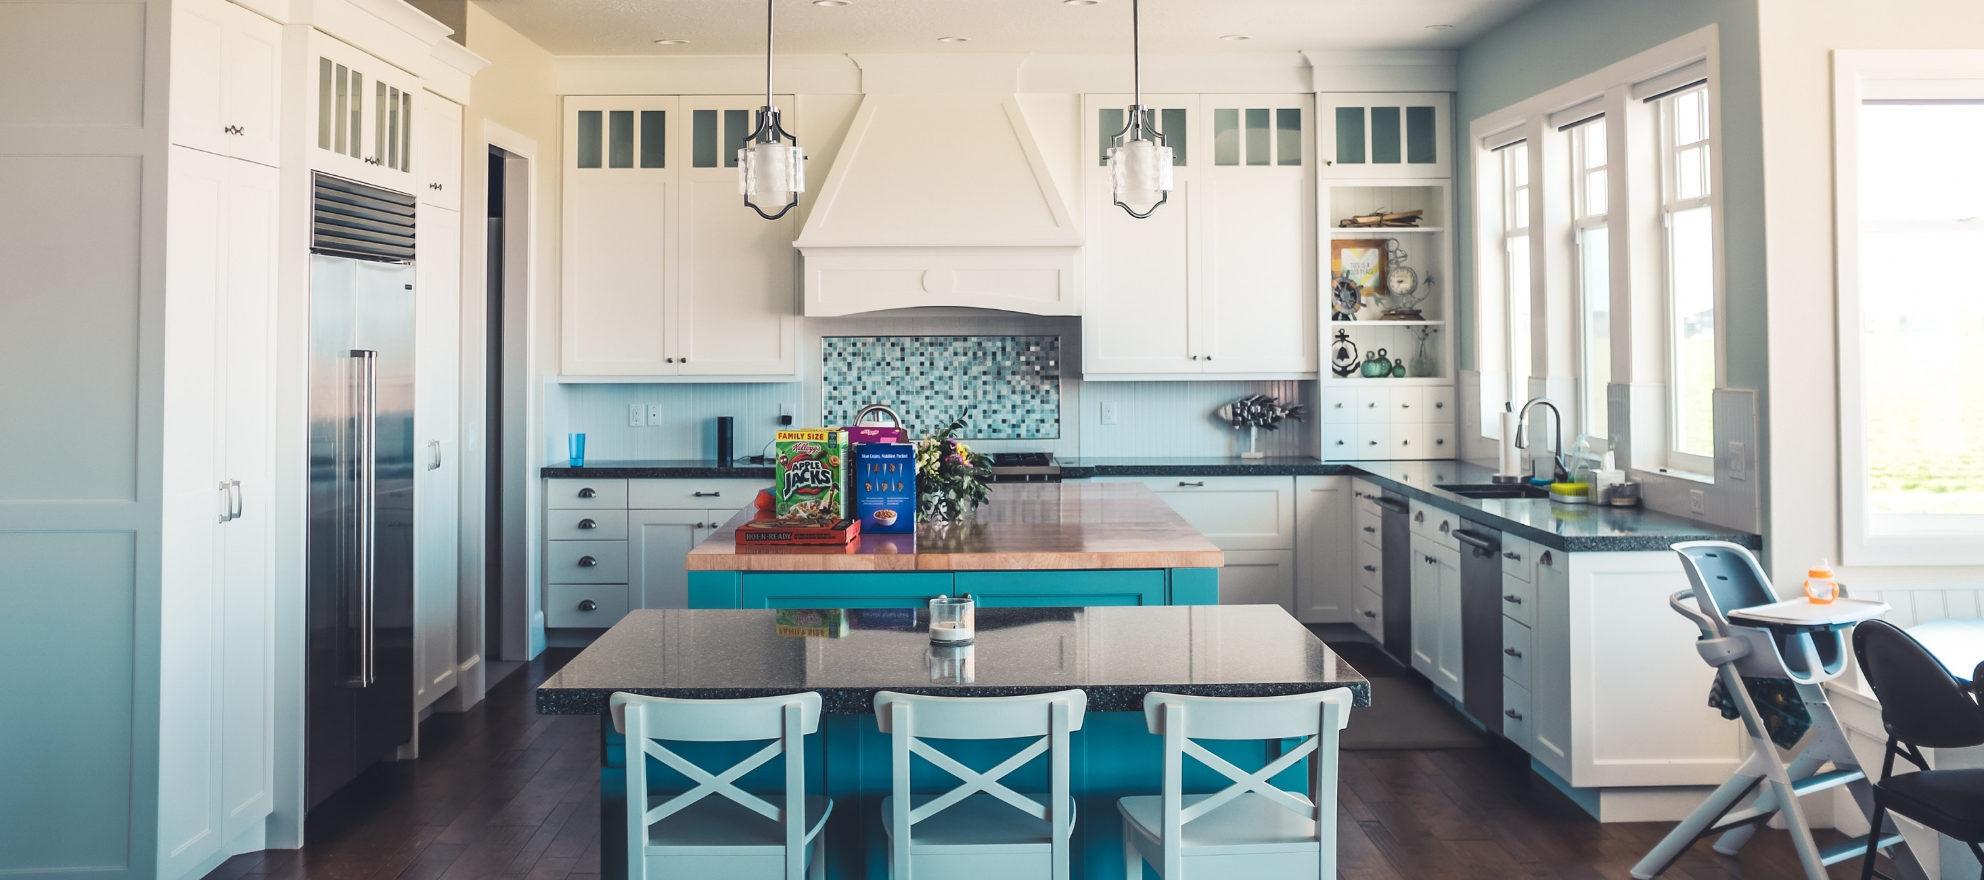 Whats New Kitchen Design